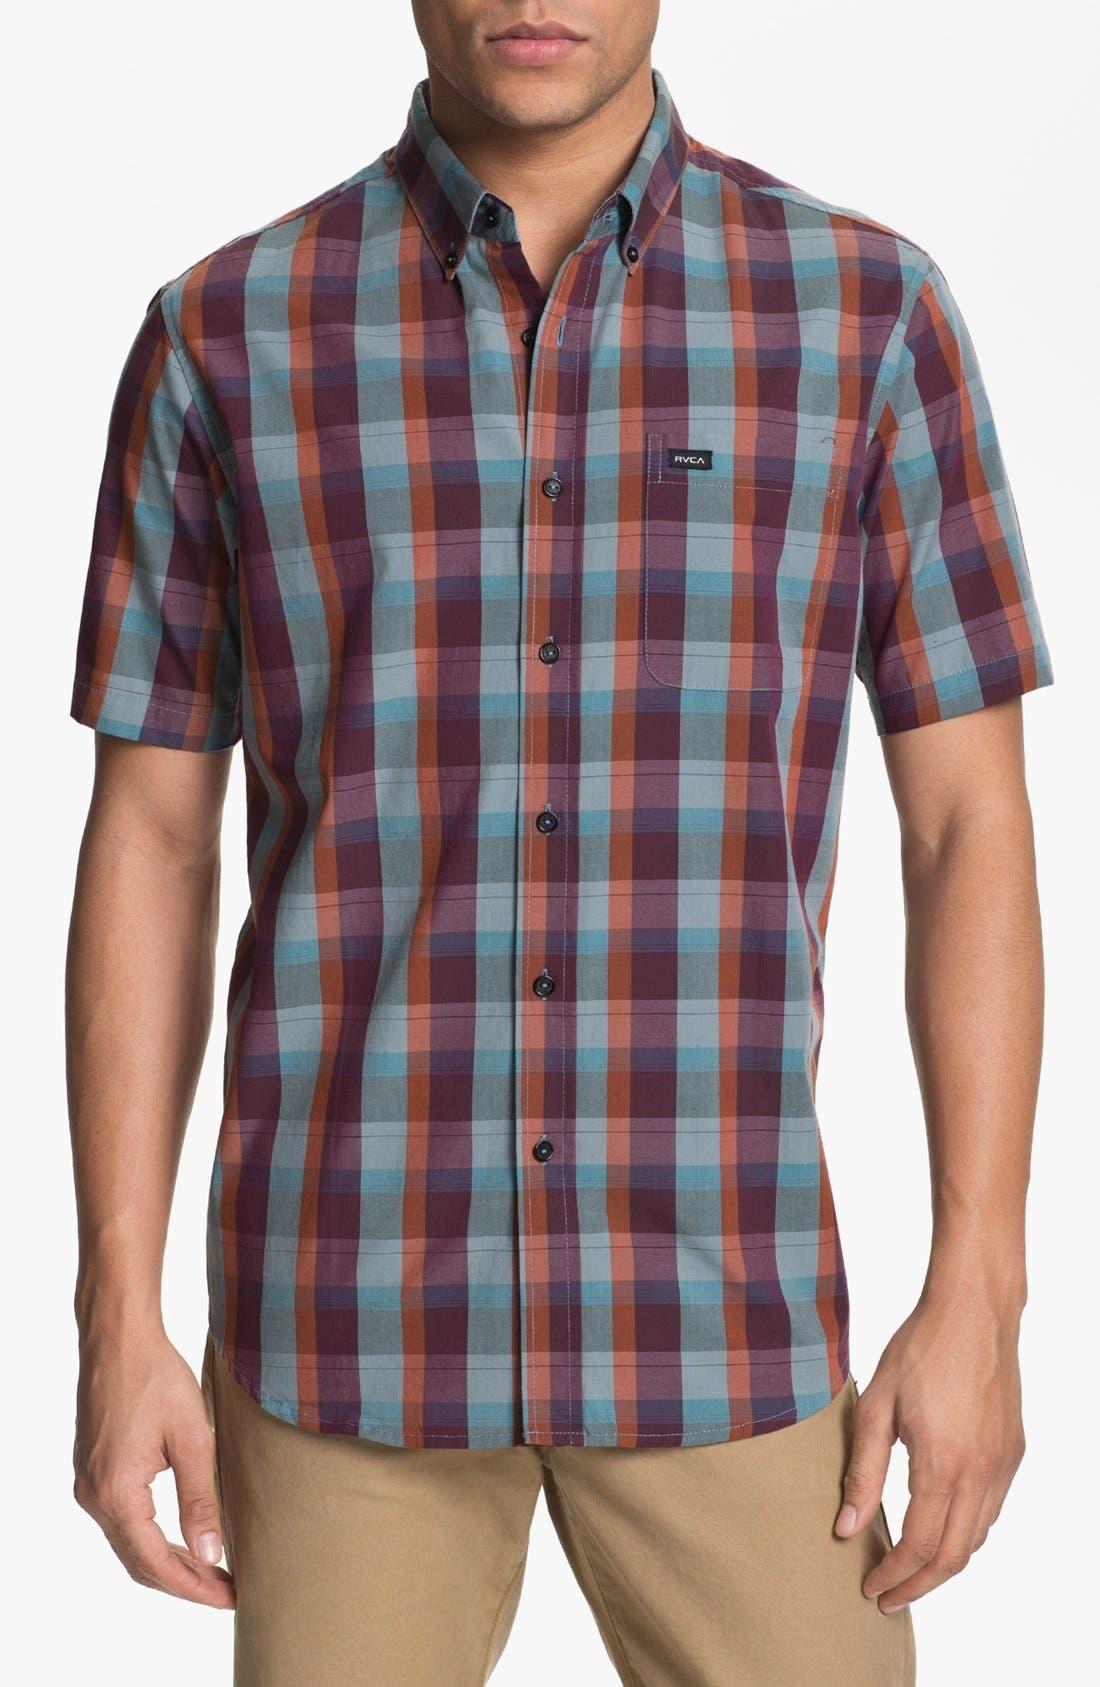 Main Image - RVCA 'Mingus' Plaid Woven Shirt